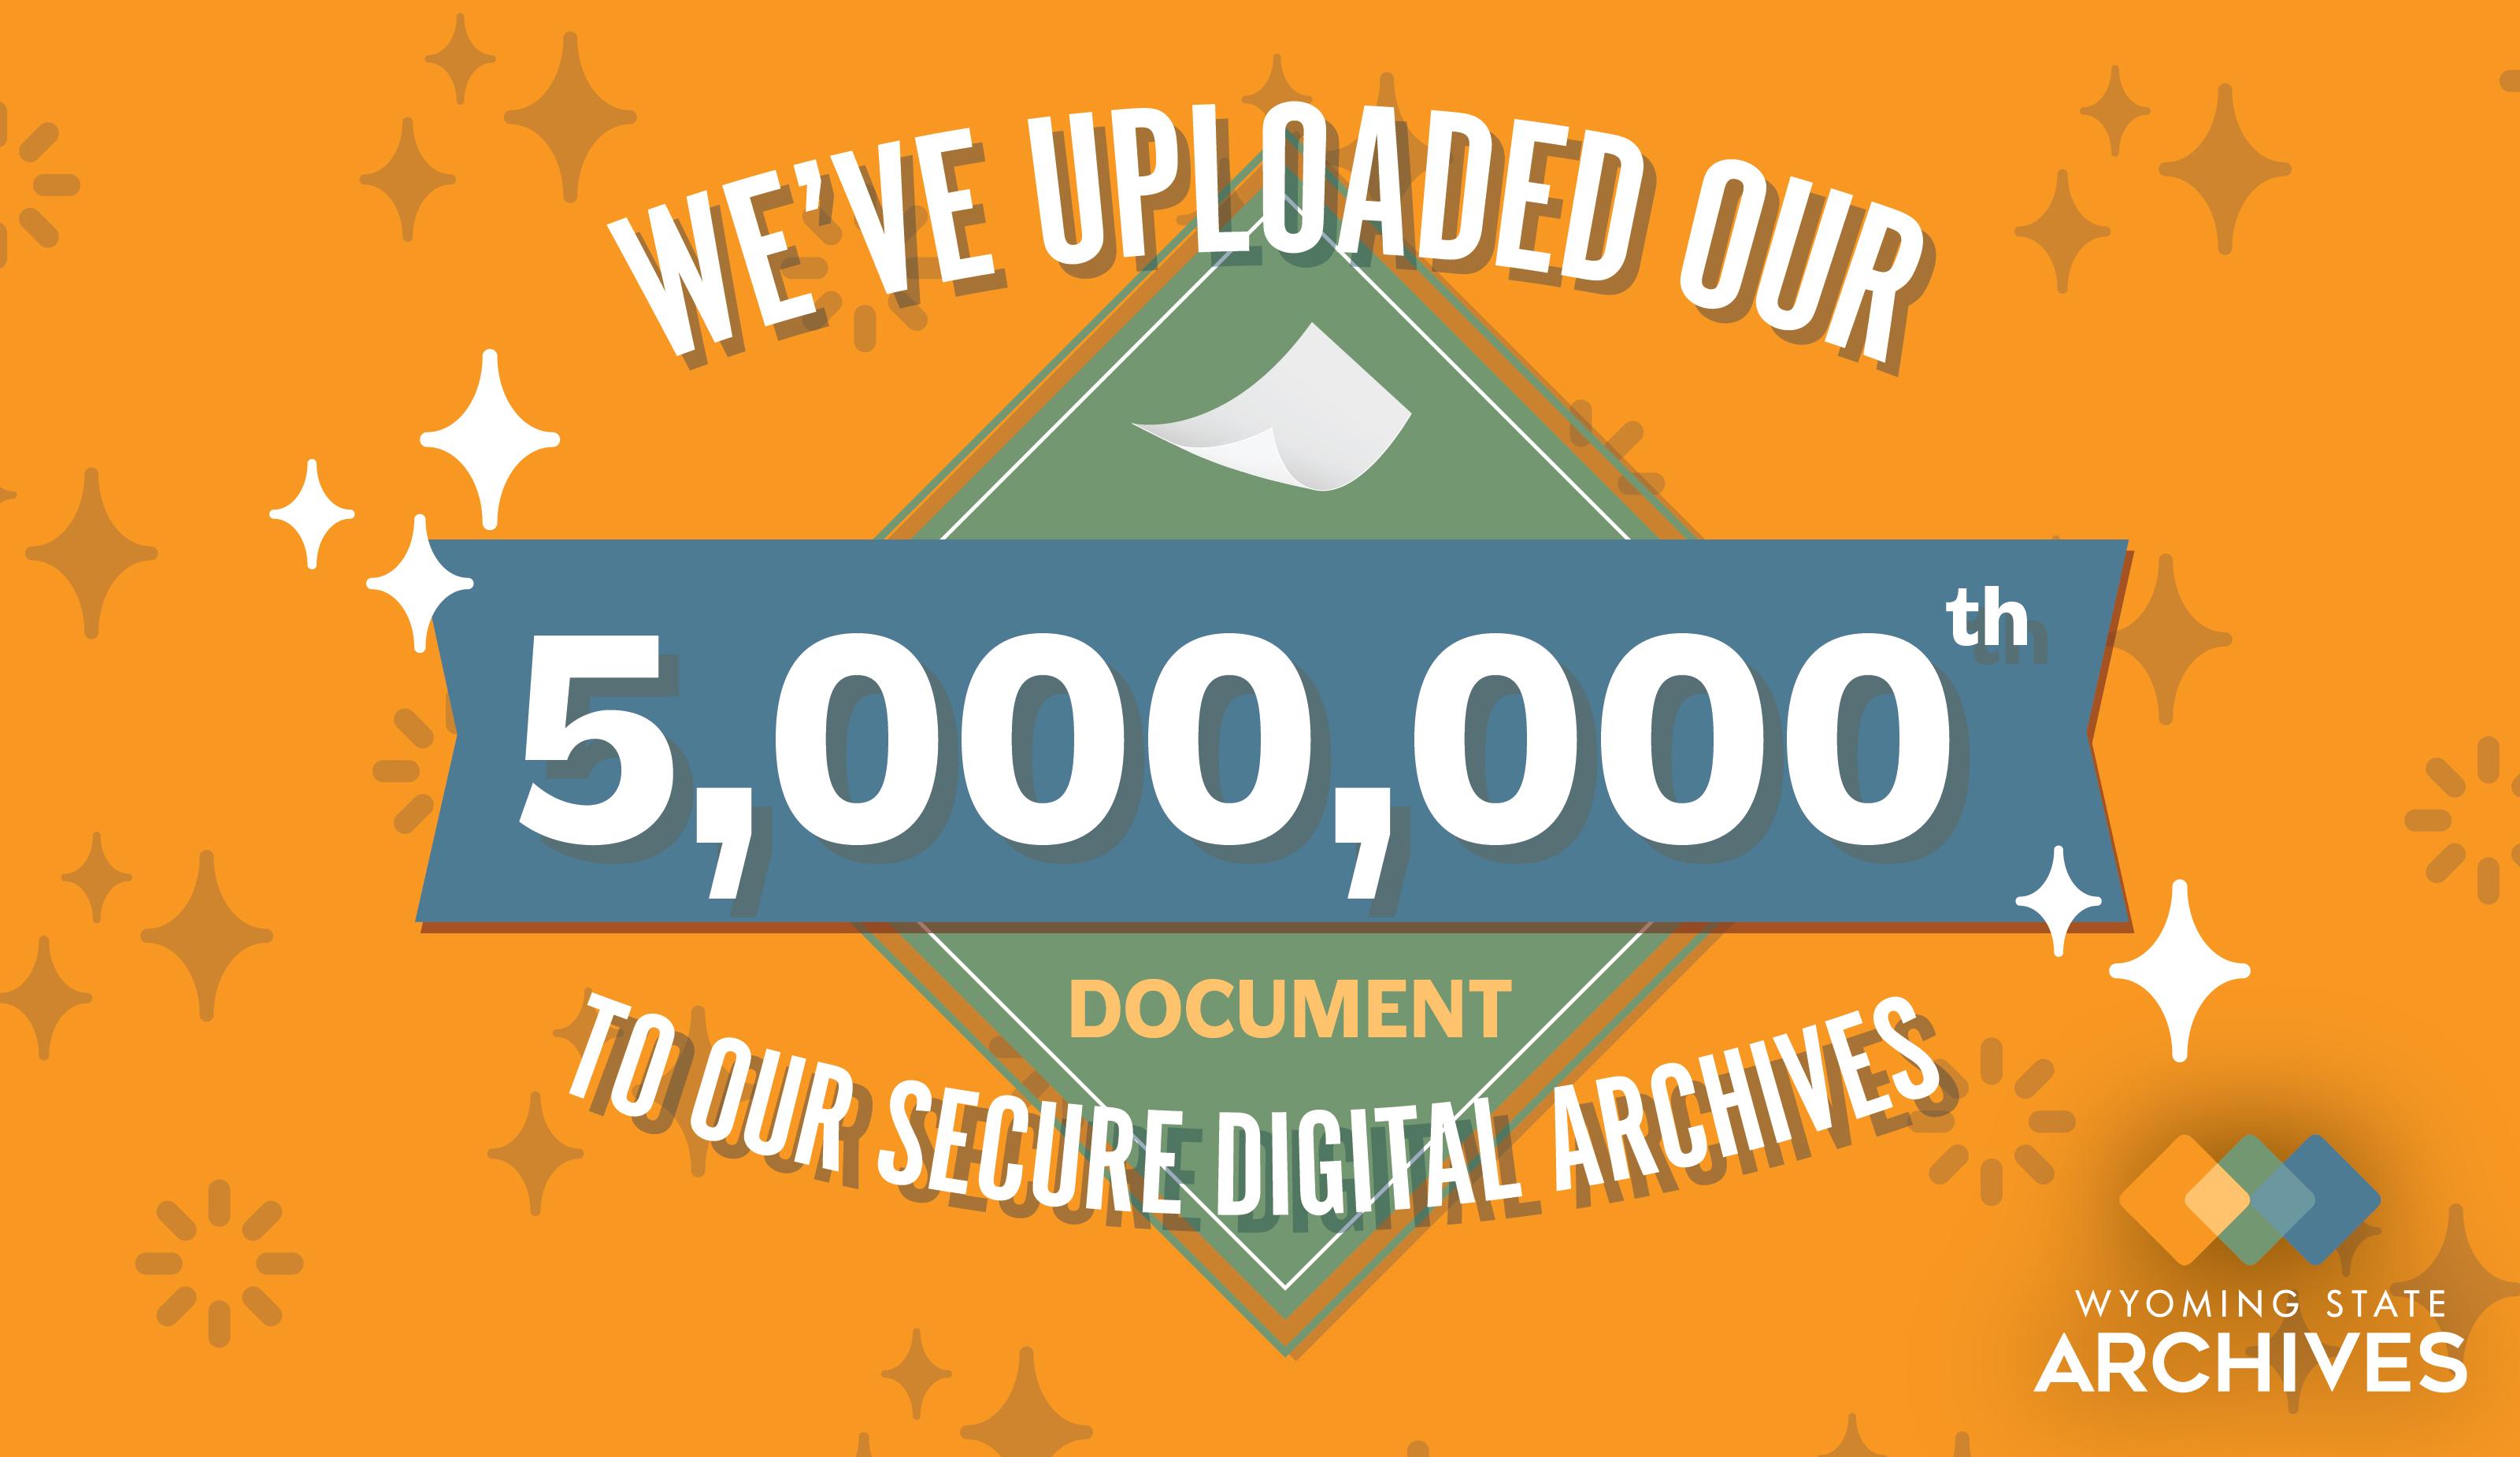 Digital Archives - 5,000,000th Upload